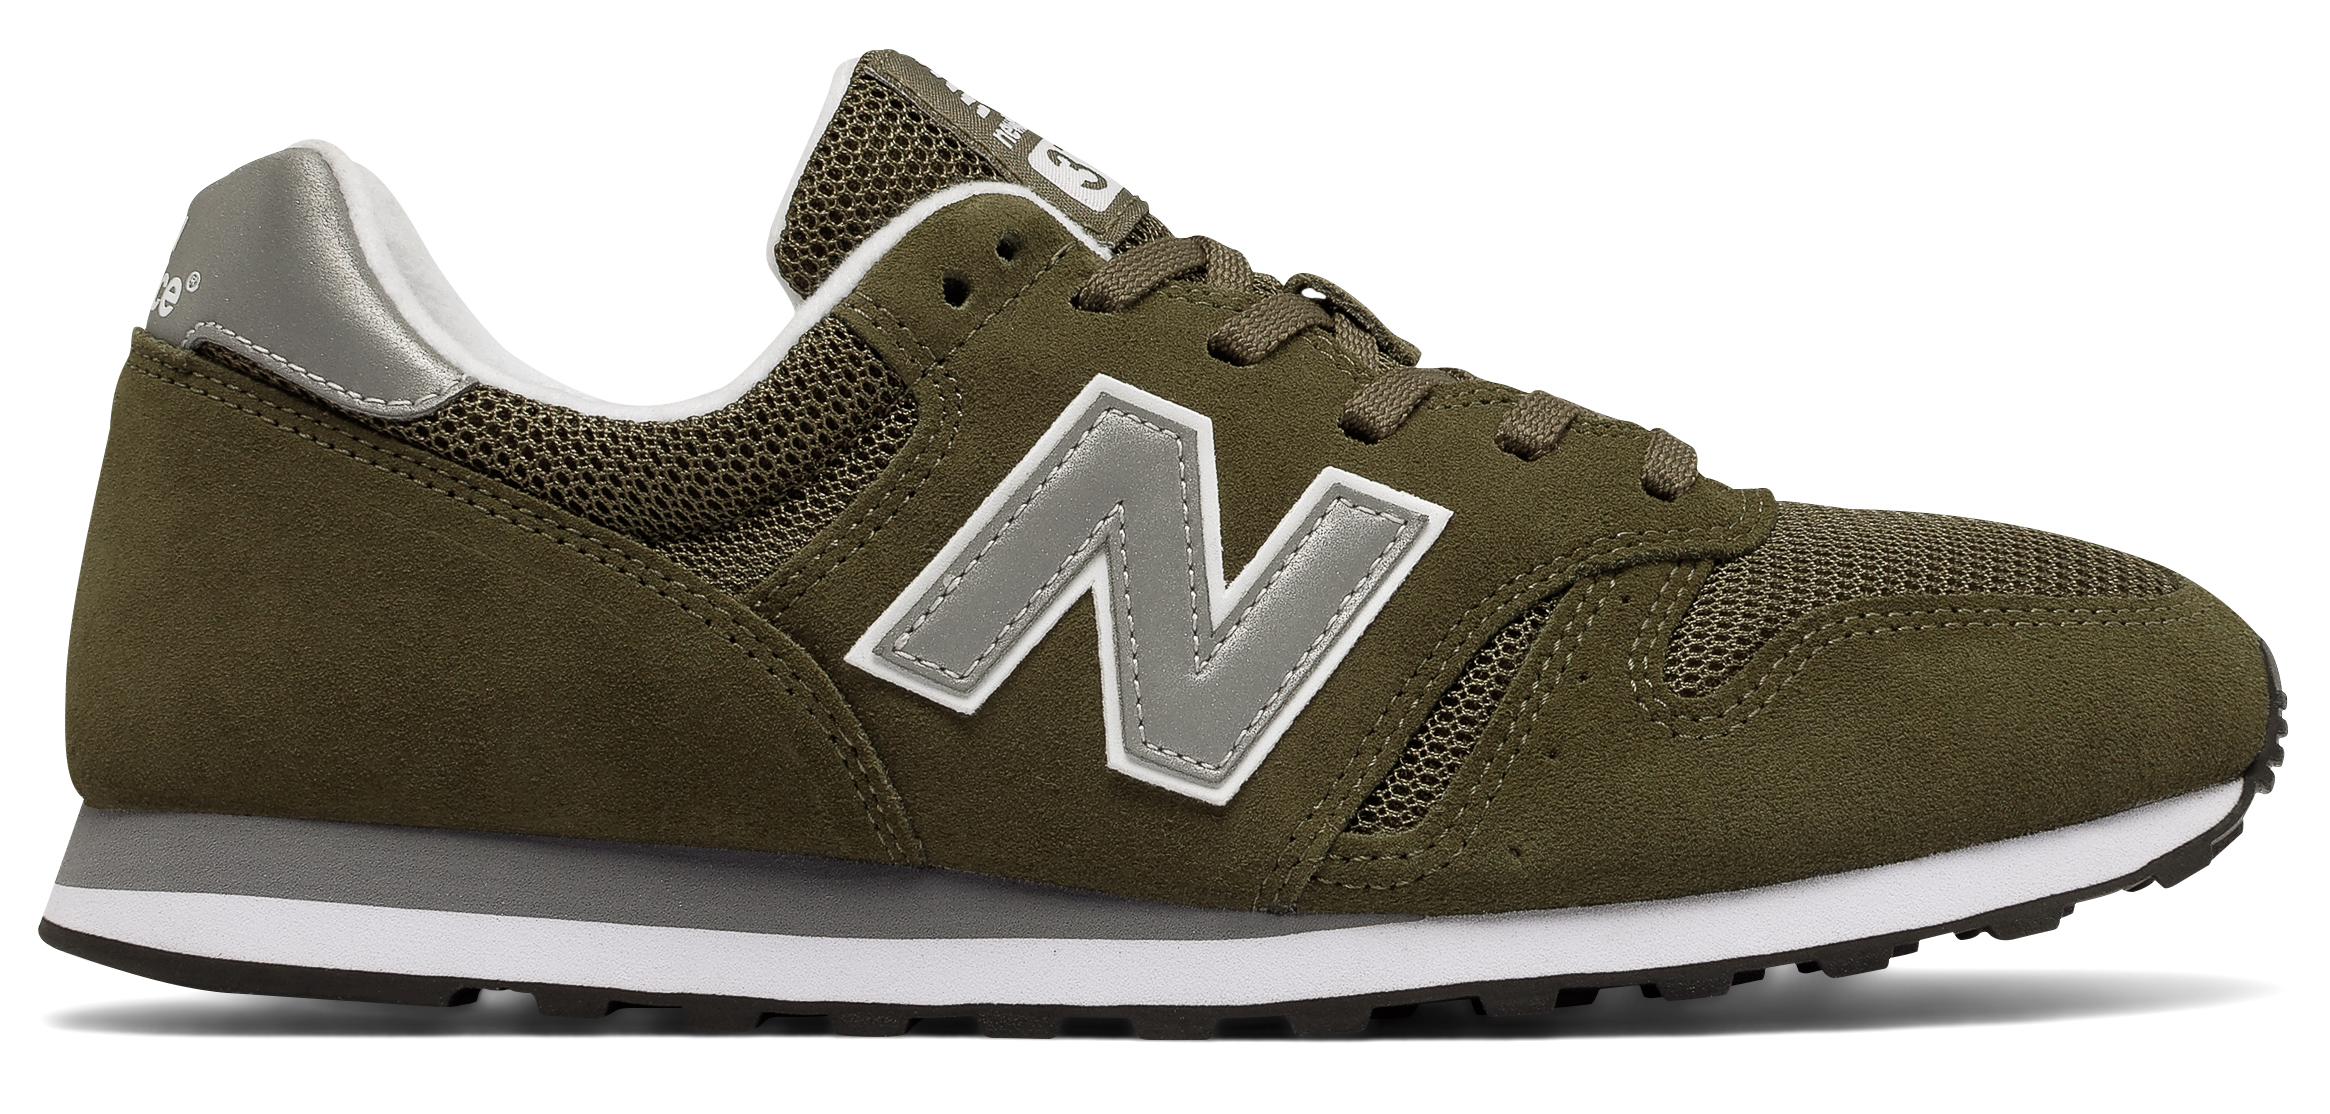 New Balance 373 Shoes - Men's   MEC